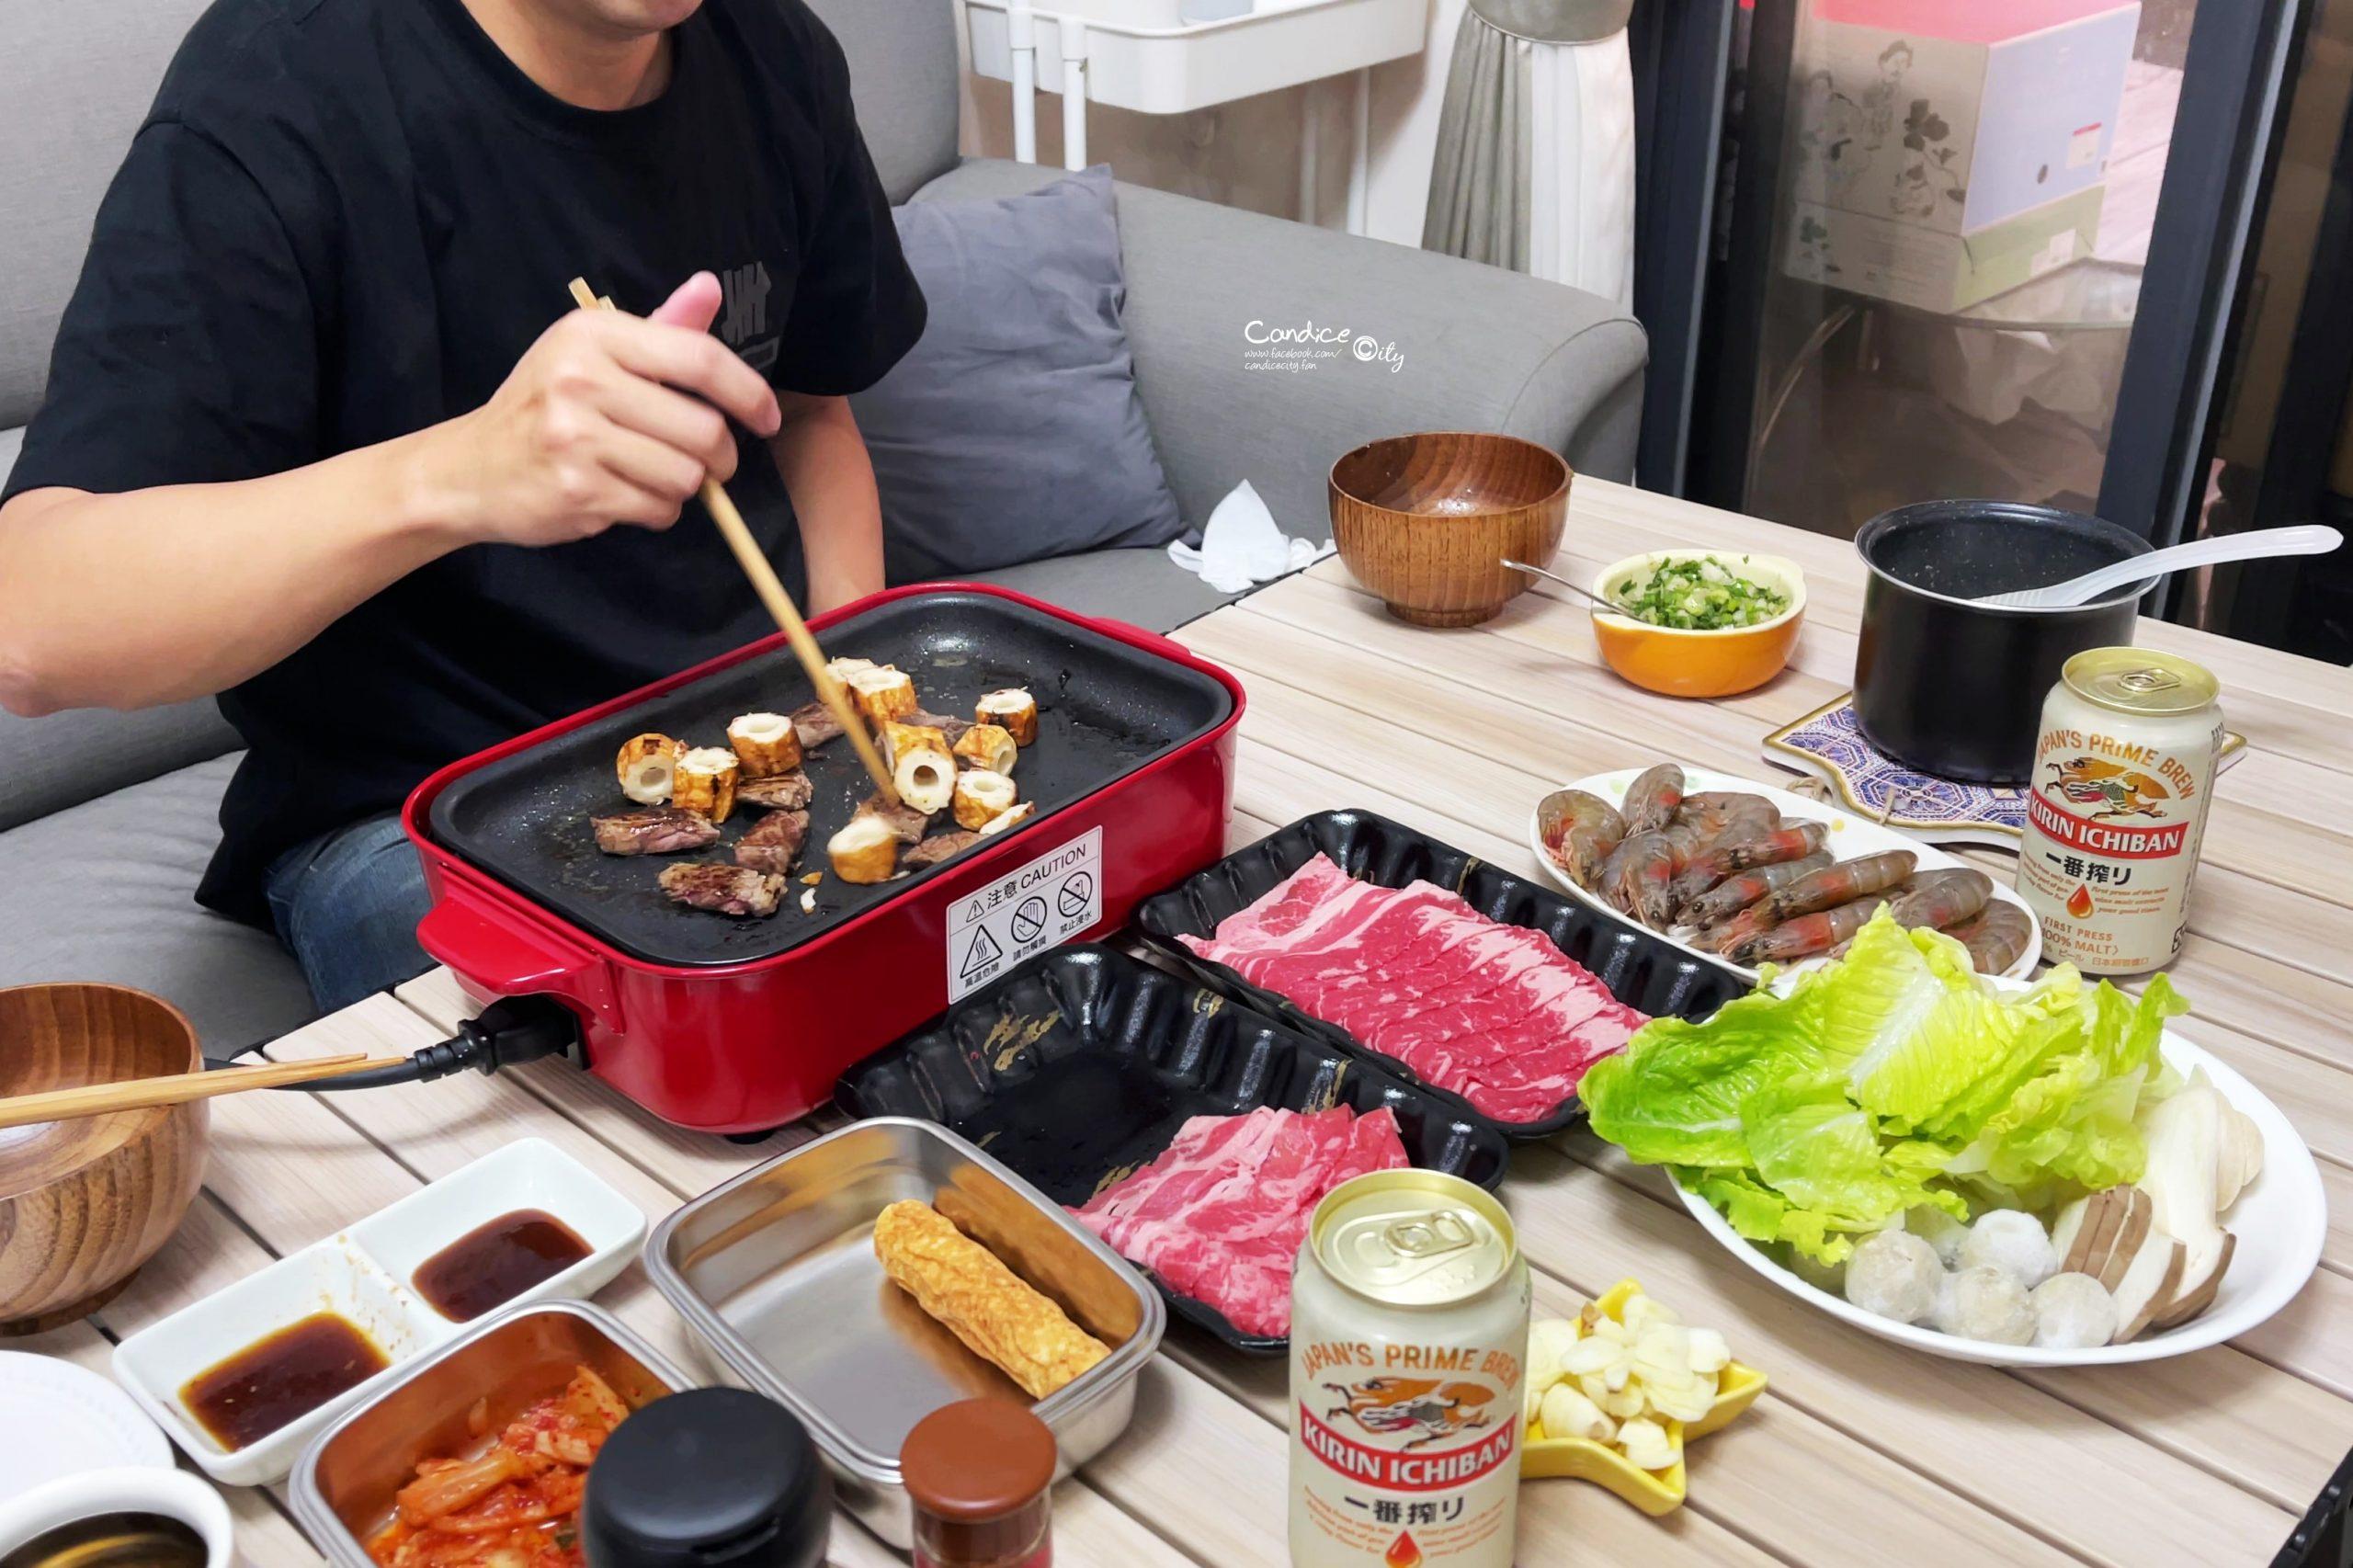 BRUNO電烤盤|章魚燒/雞蛋糕/鬆餅/烤肉/火鍋樣樣行!每個家裡必備的電器(團購ing)